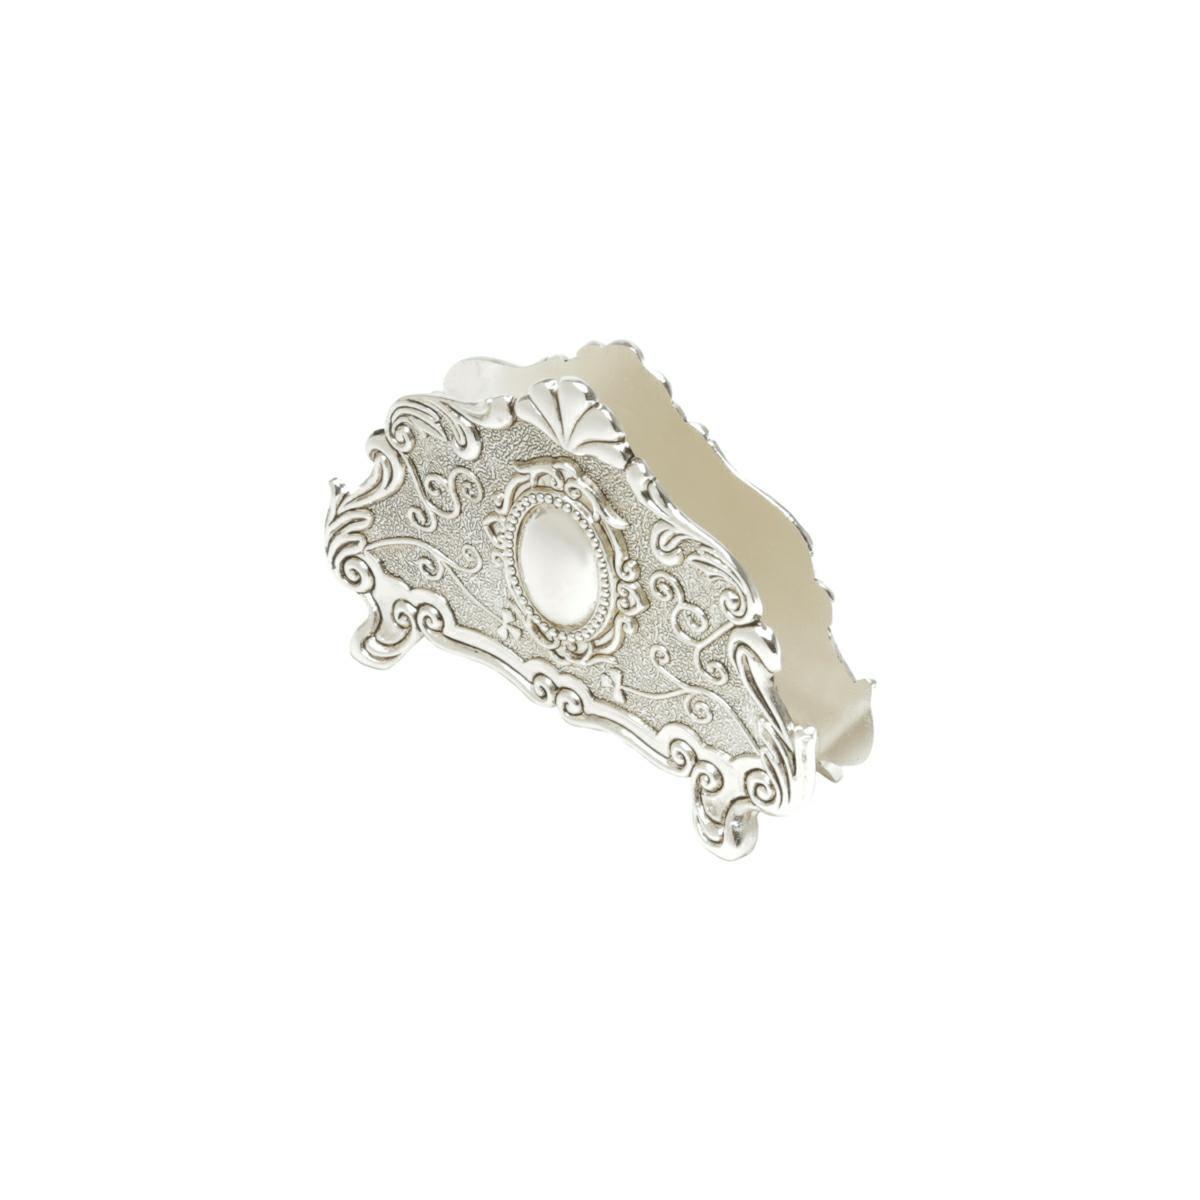 Porta-Guardanapo 13 cm de zamac prateado Prestige - 35574